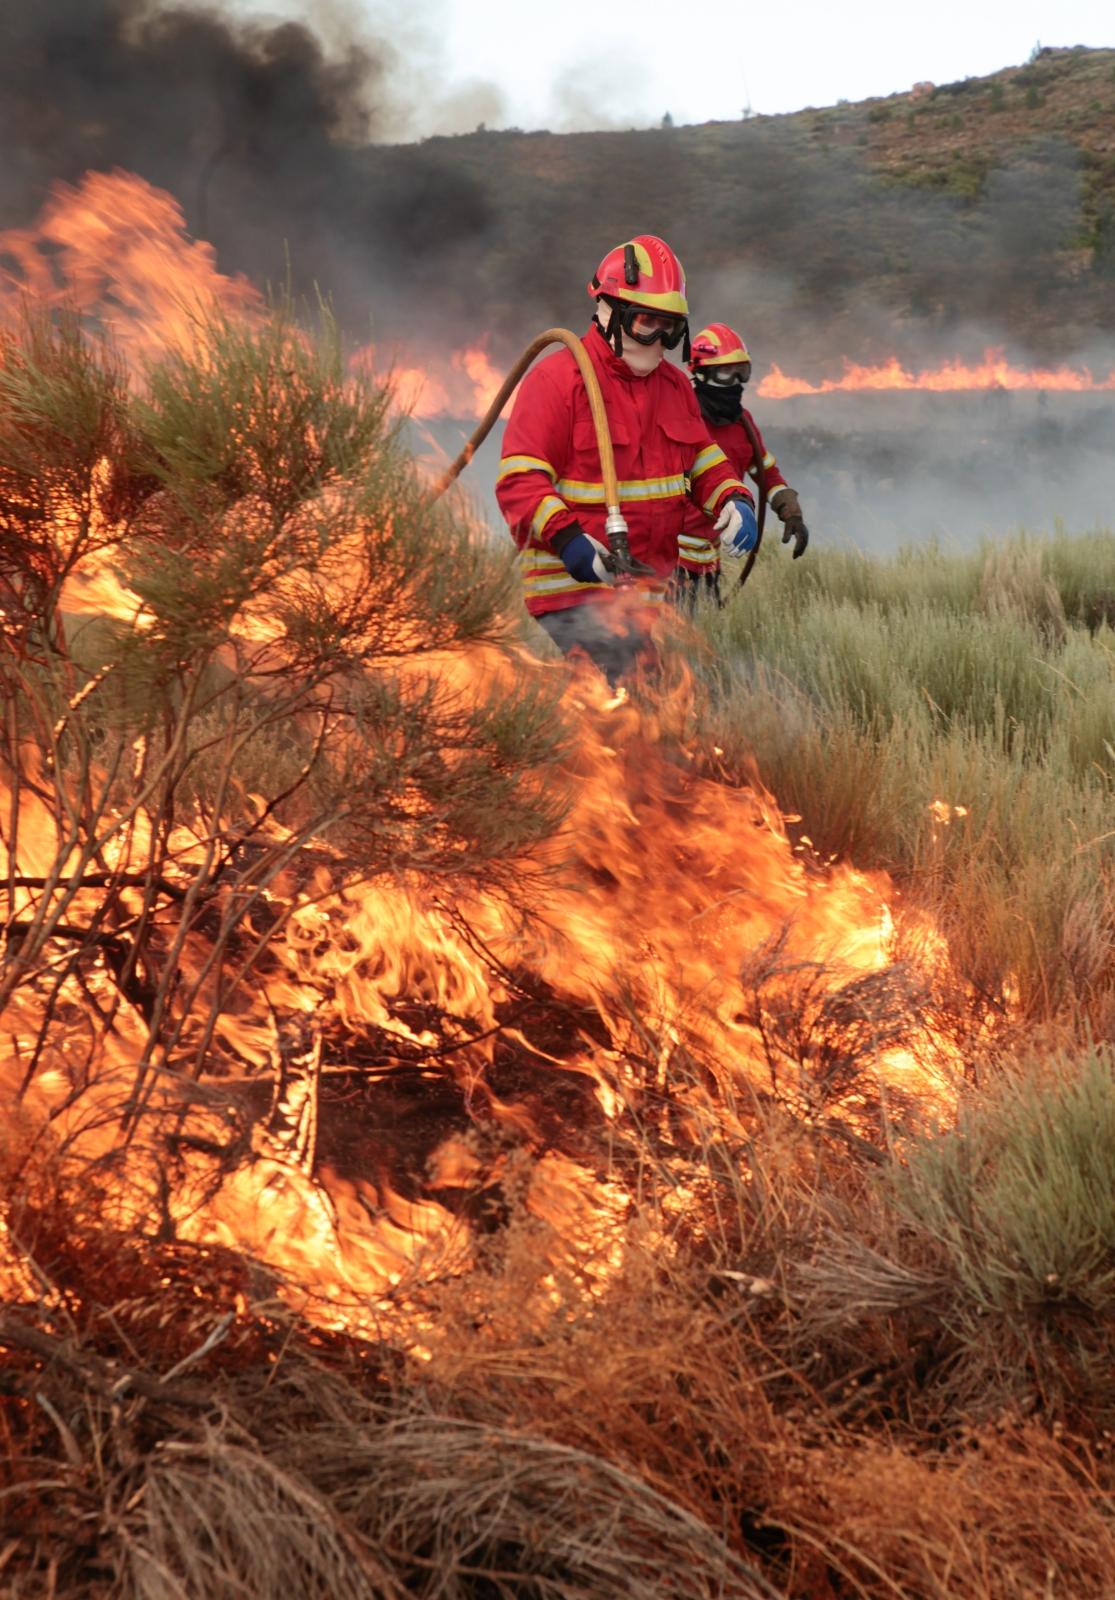 Pożary w Hiszpanii EPA/MIGUEL PEREIRA DA SILVA